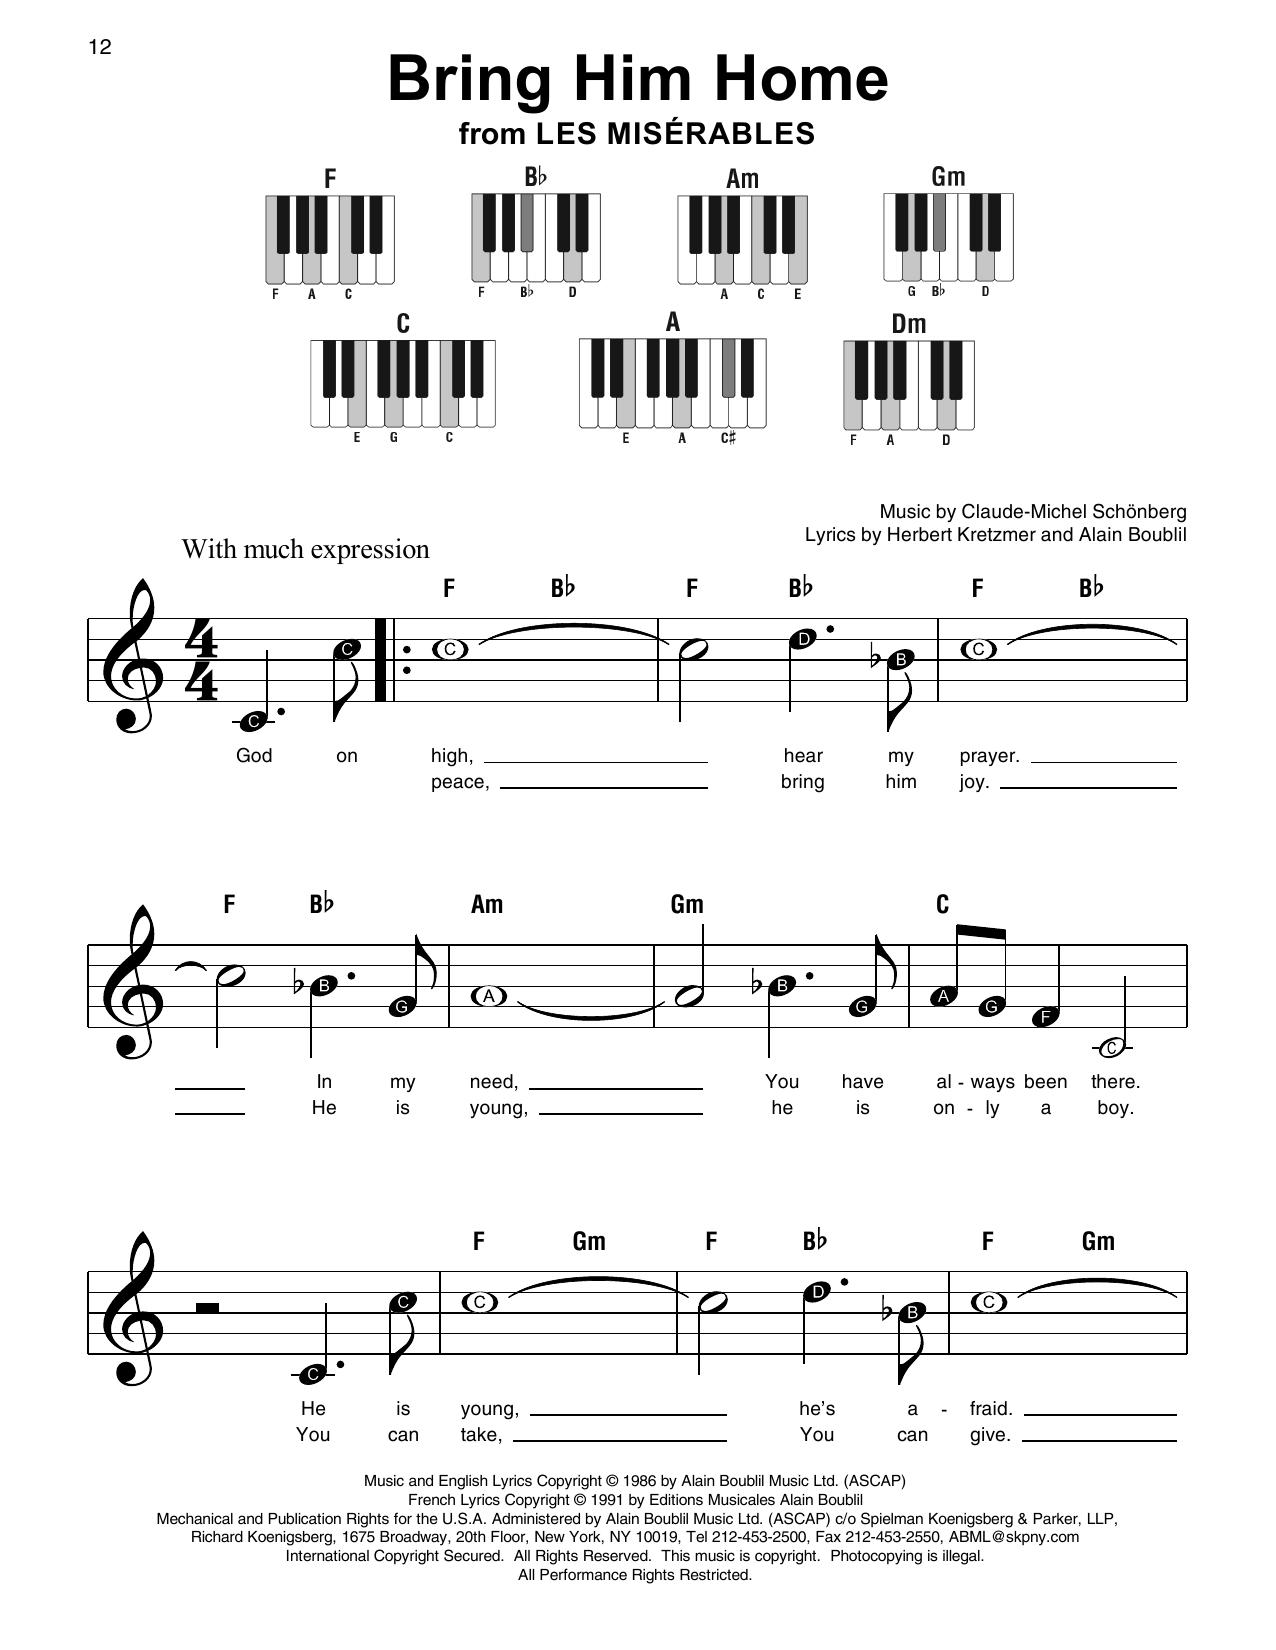 Bring Him Home sheet music by Claude Michel Schonberg Super Easy